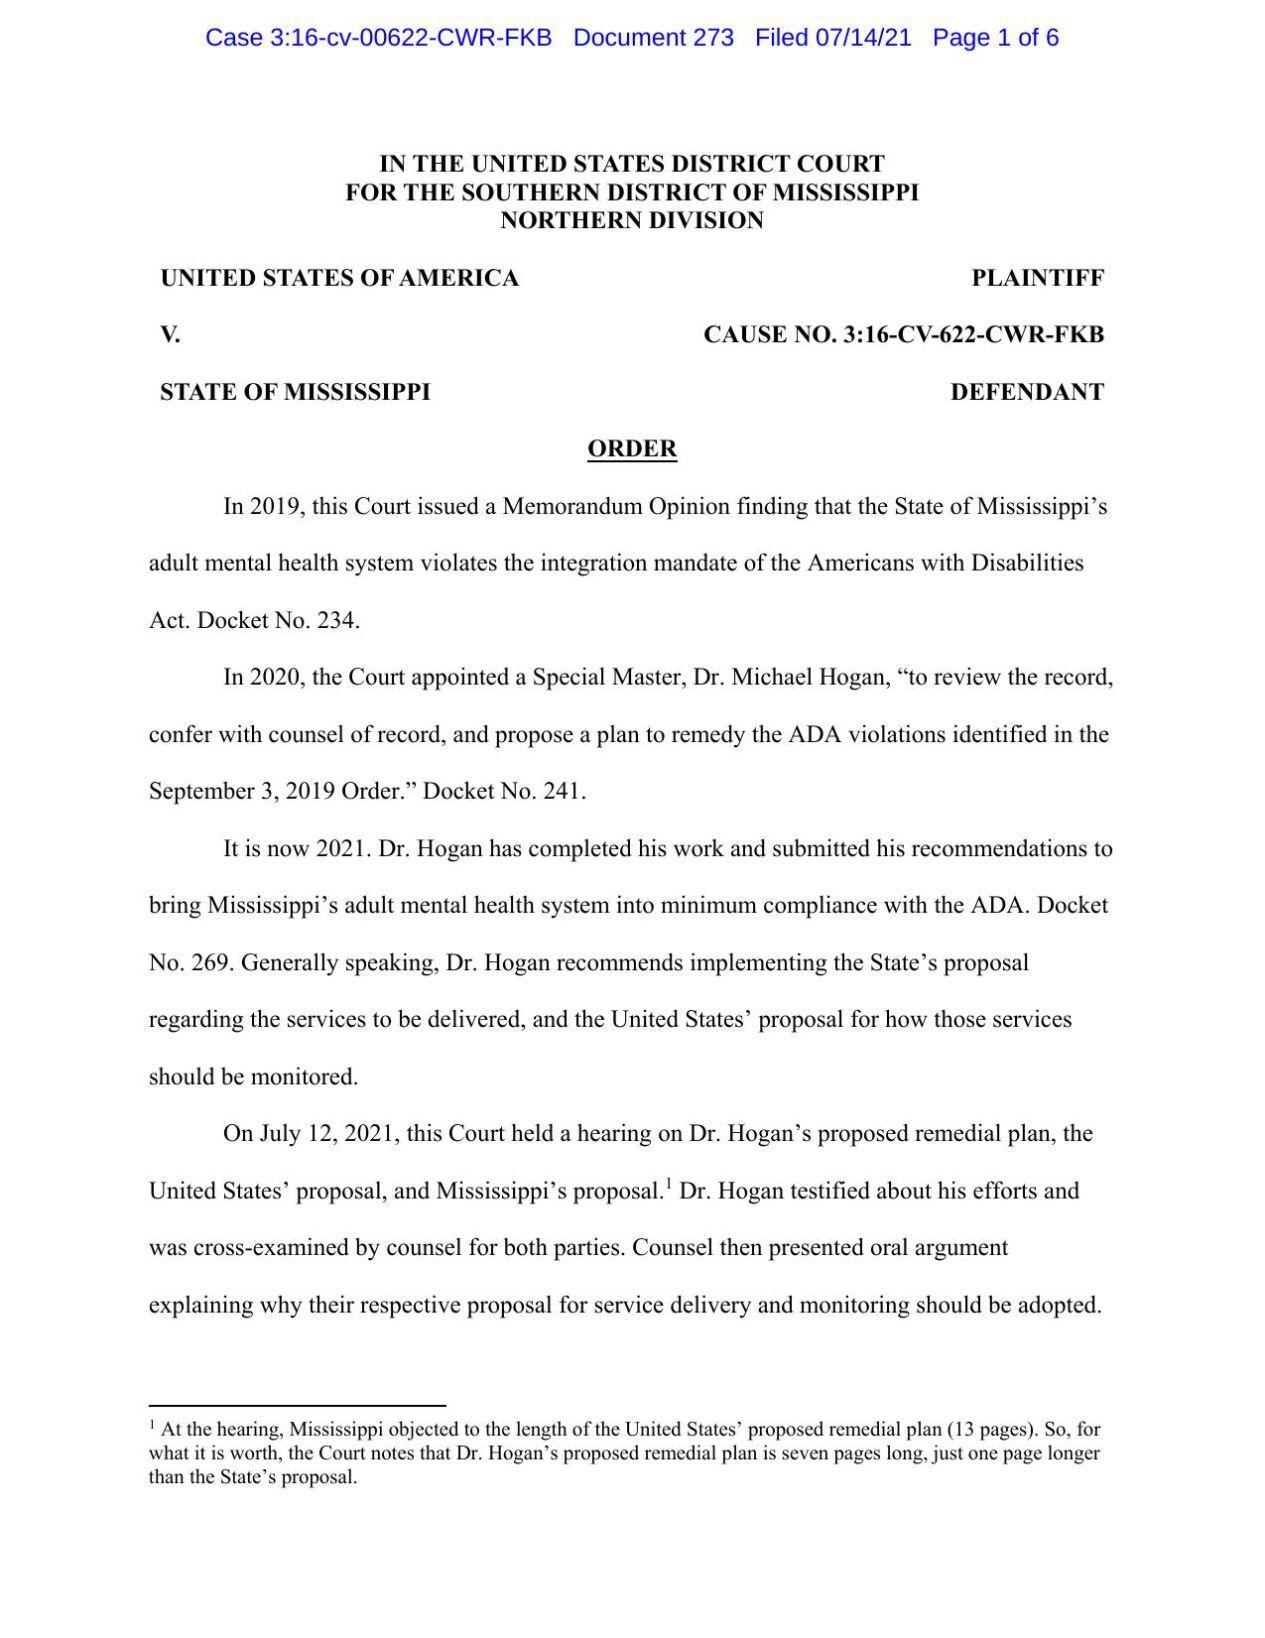 Judge Carlton Reeves' order